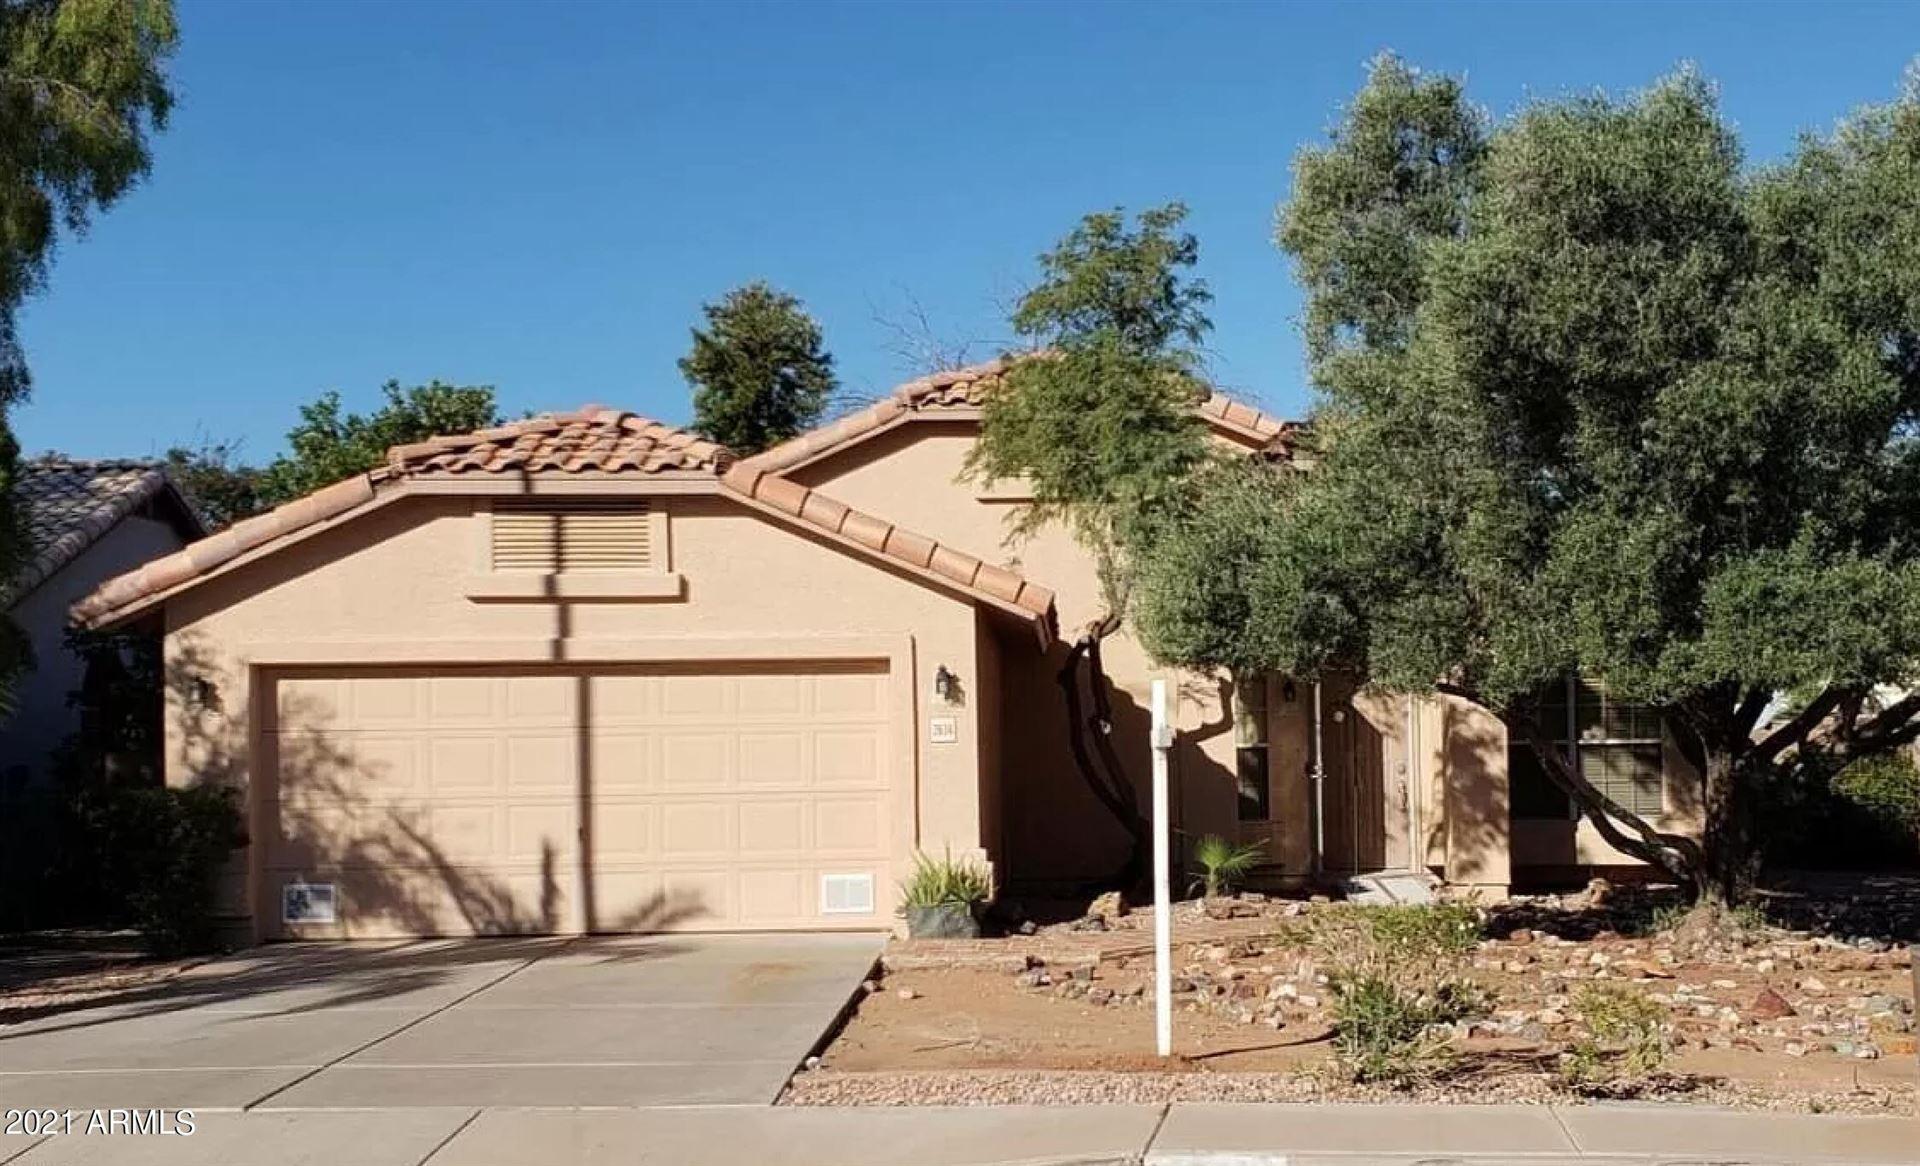 Photo of 2634 S VINEYARD --, Mesa, AZ 85210 (MLS # 6198994)